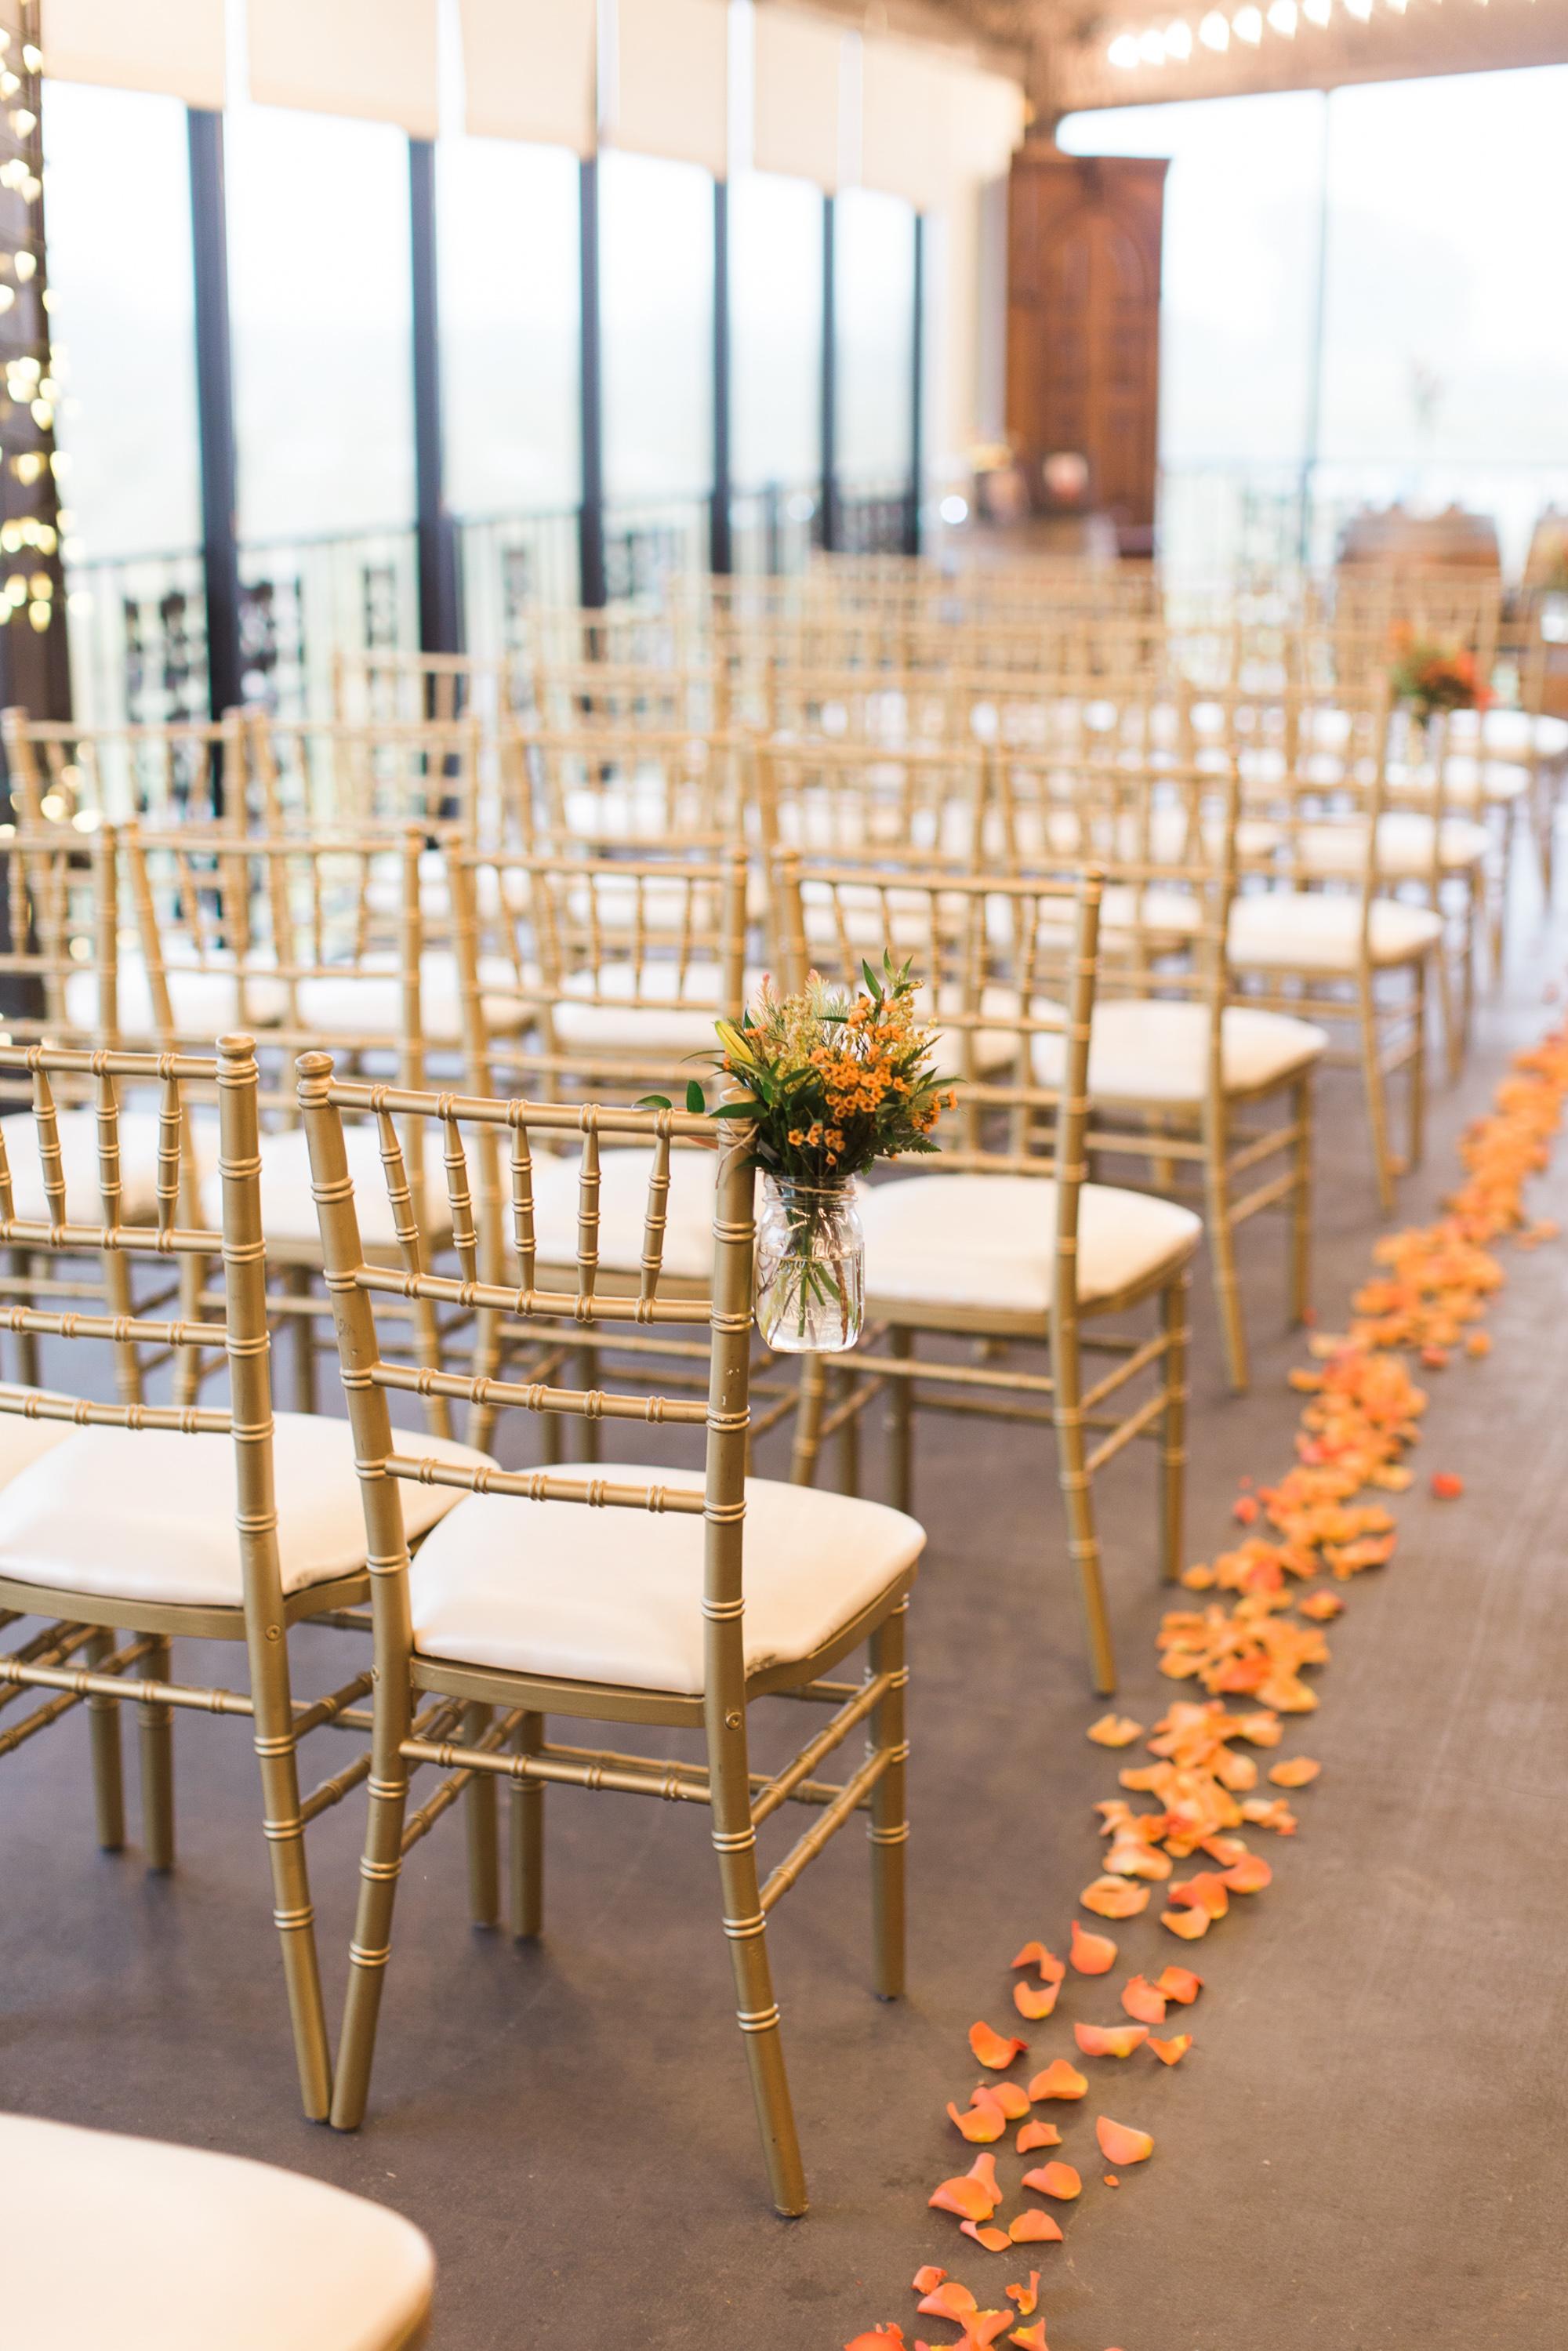 452c4-messina-hof-wedding-22messina-hof-wedding-22.jpg